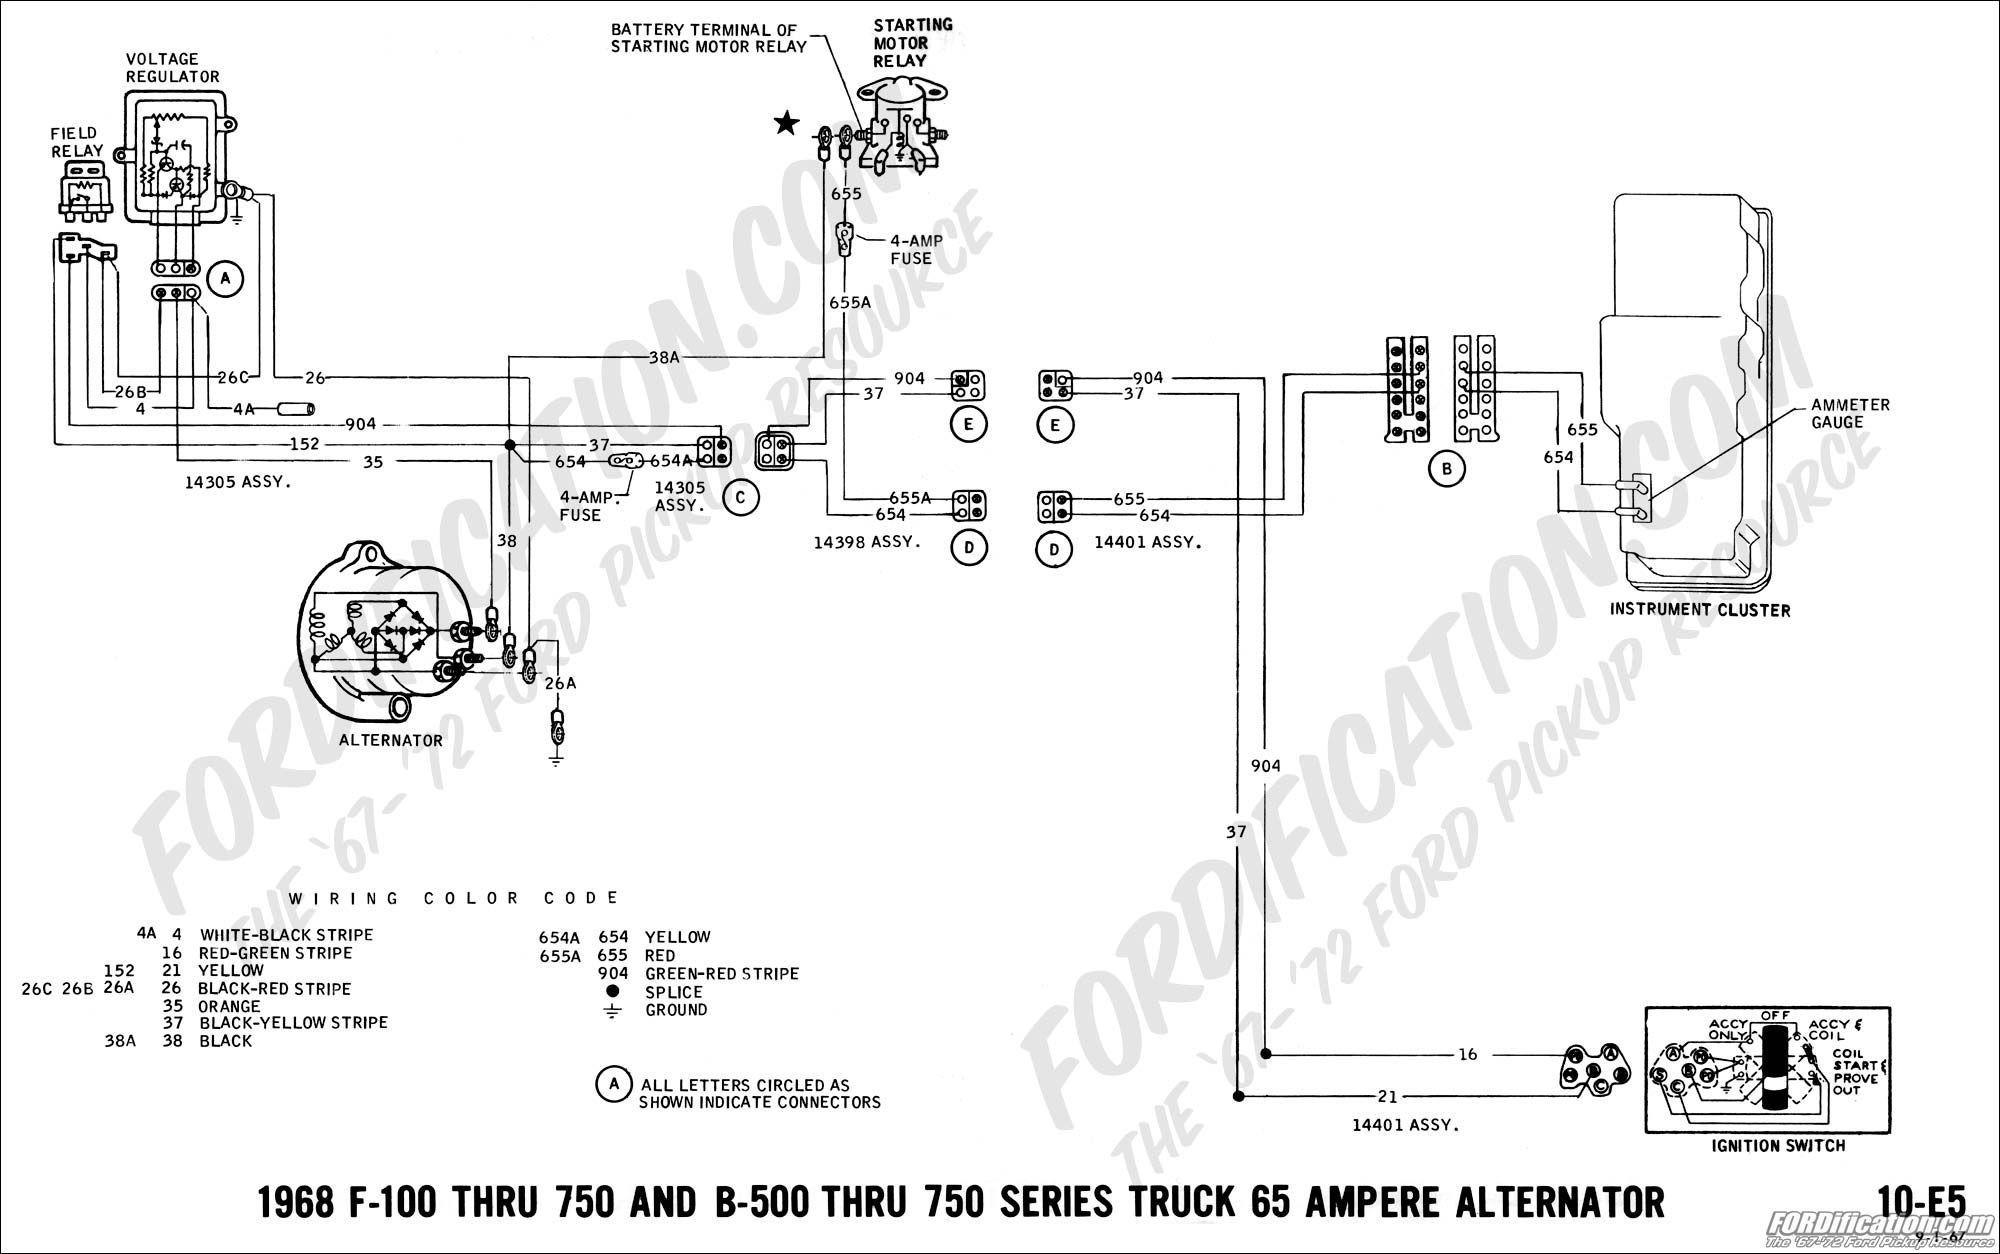 kubota rtv wiring schematic kubota wiring diagram pdf kubota diesel ignition switch wiring  kubota wiring diagram pdf kubota diesel